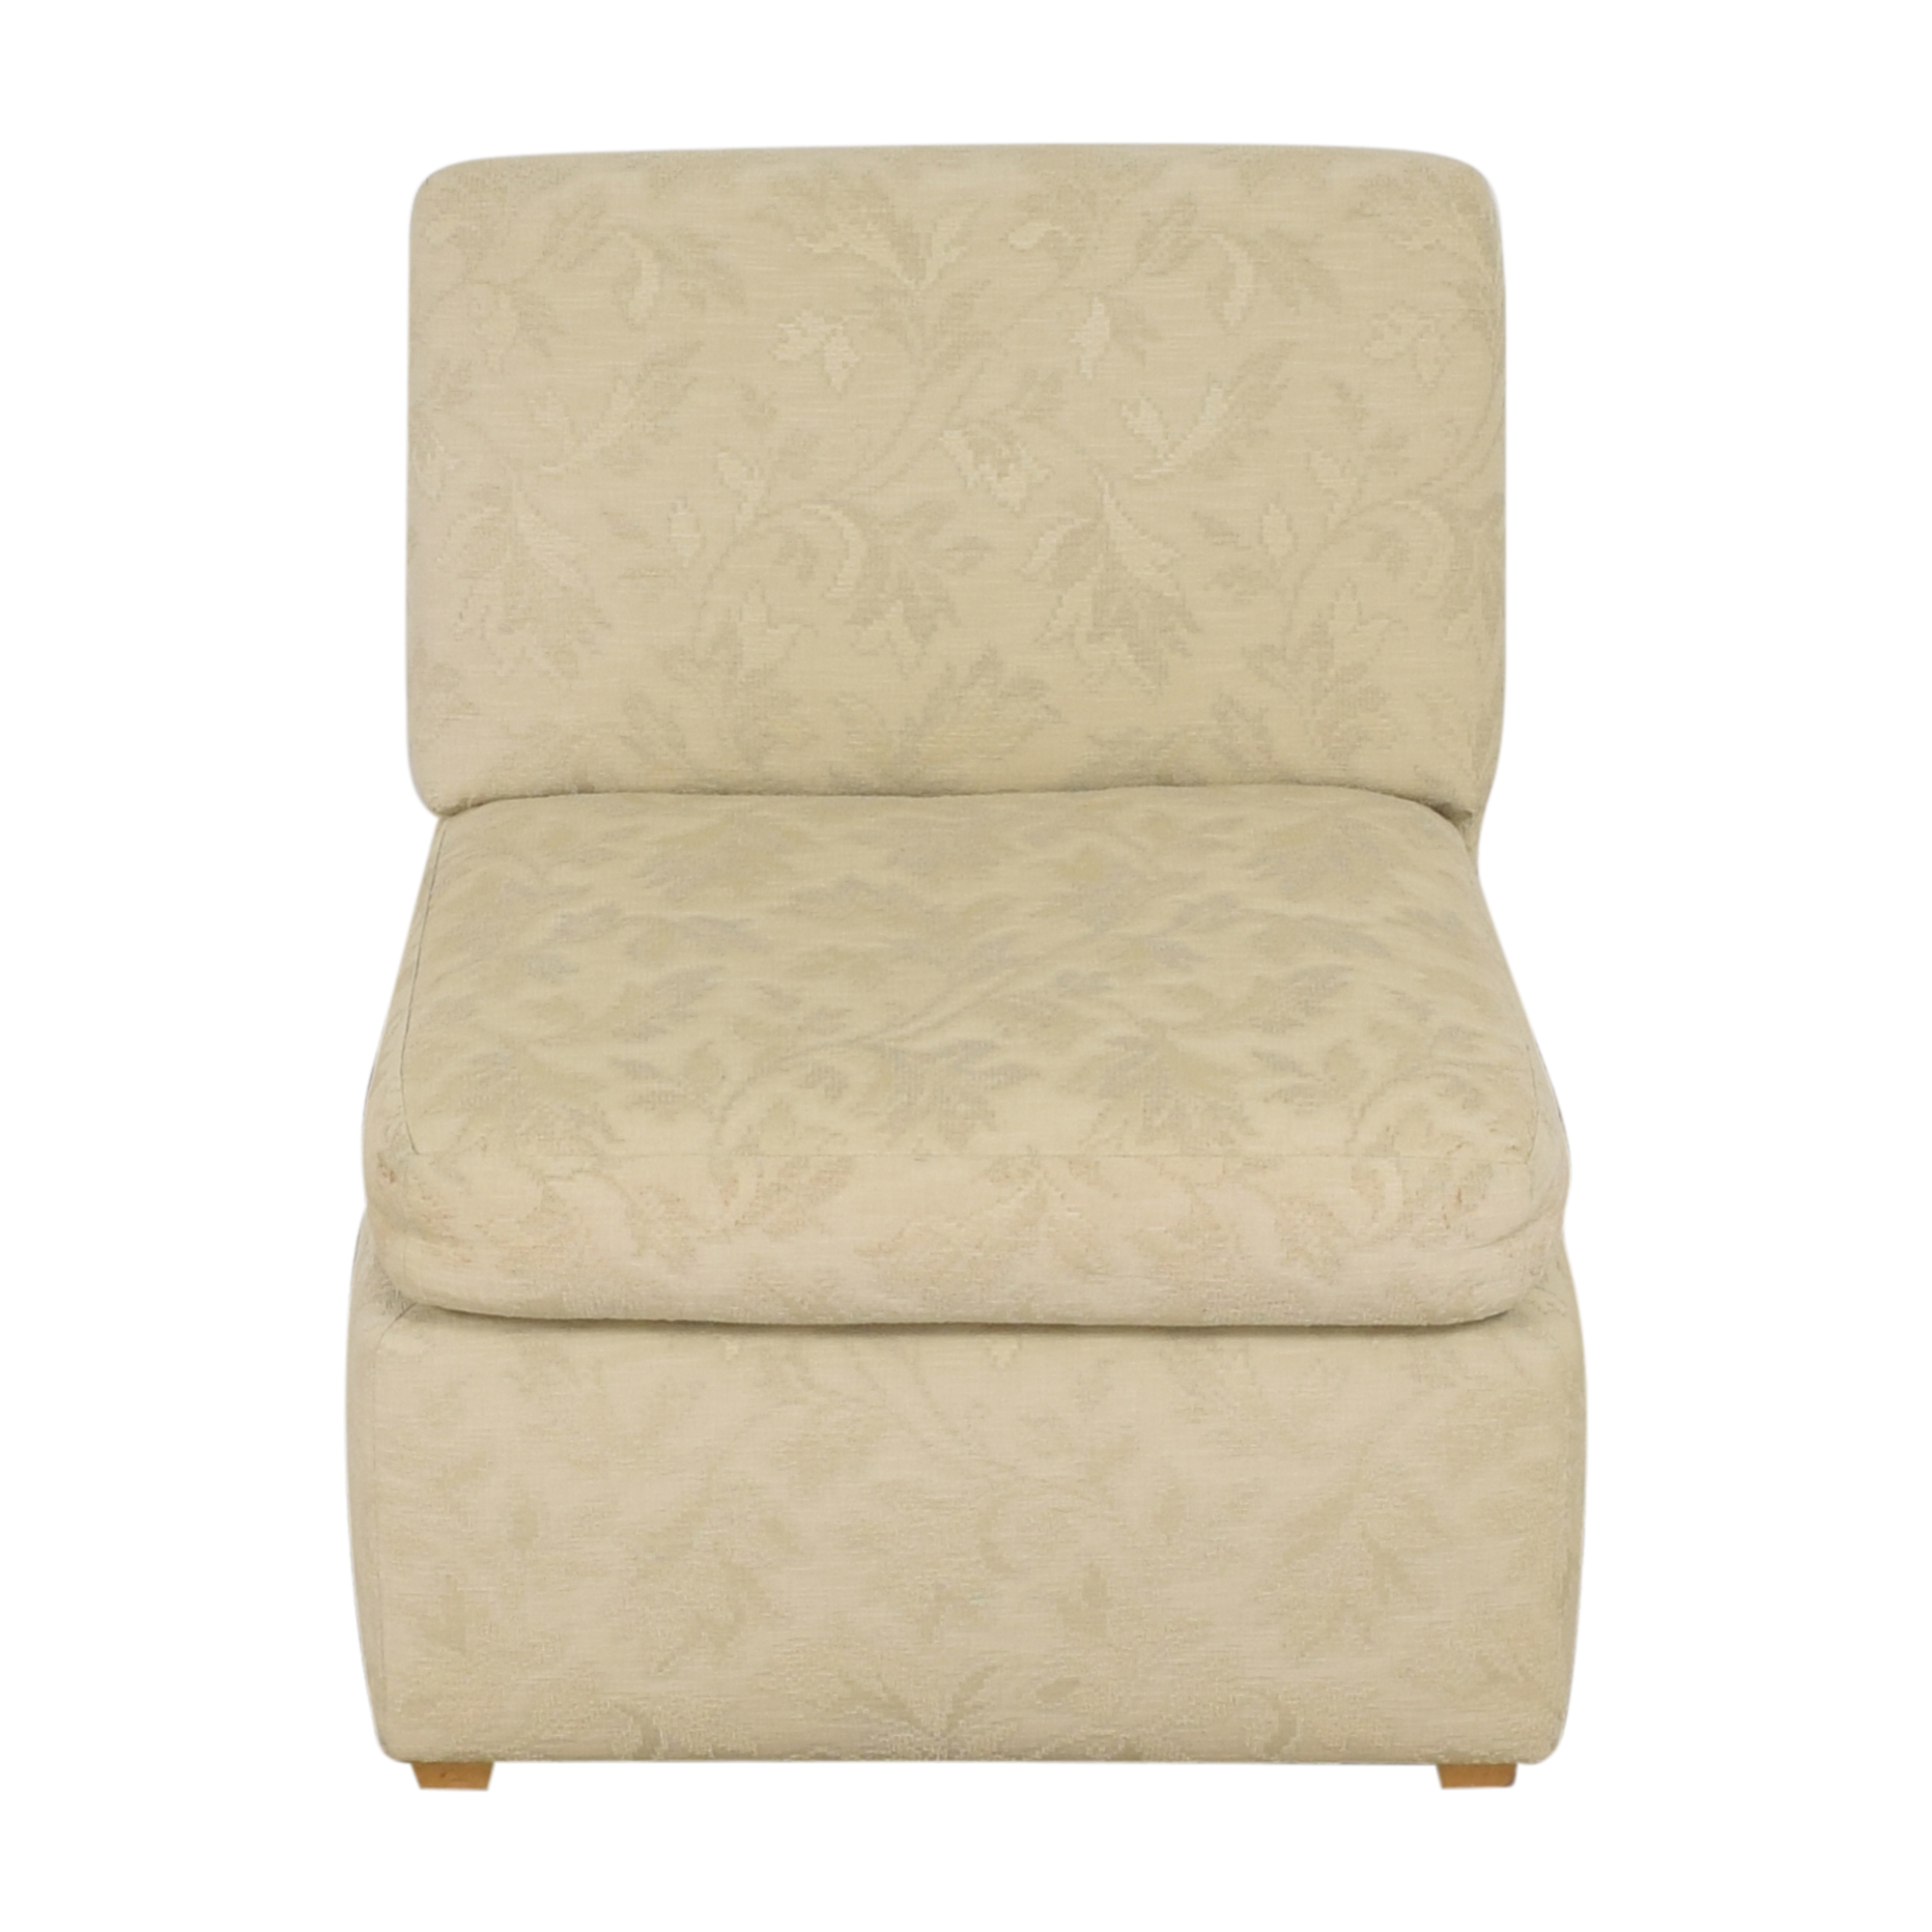 shop Billy Baldwin Studio Billy Baldwin Studio Large Slipper Chair by Ventry online